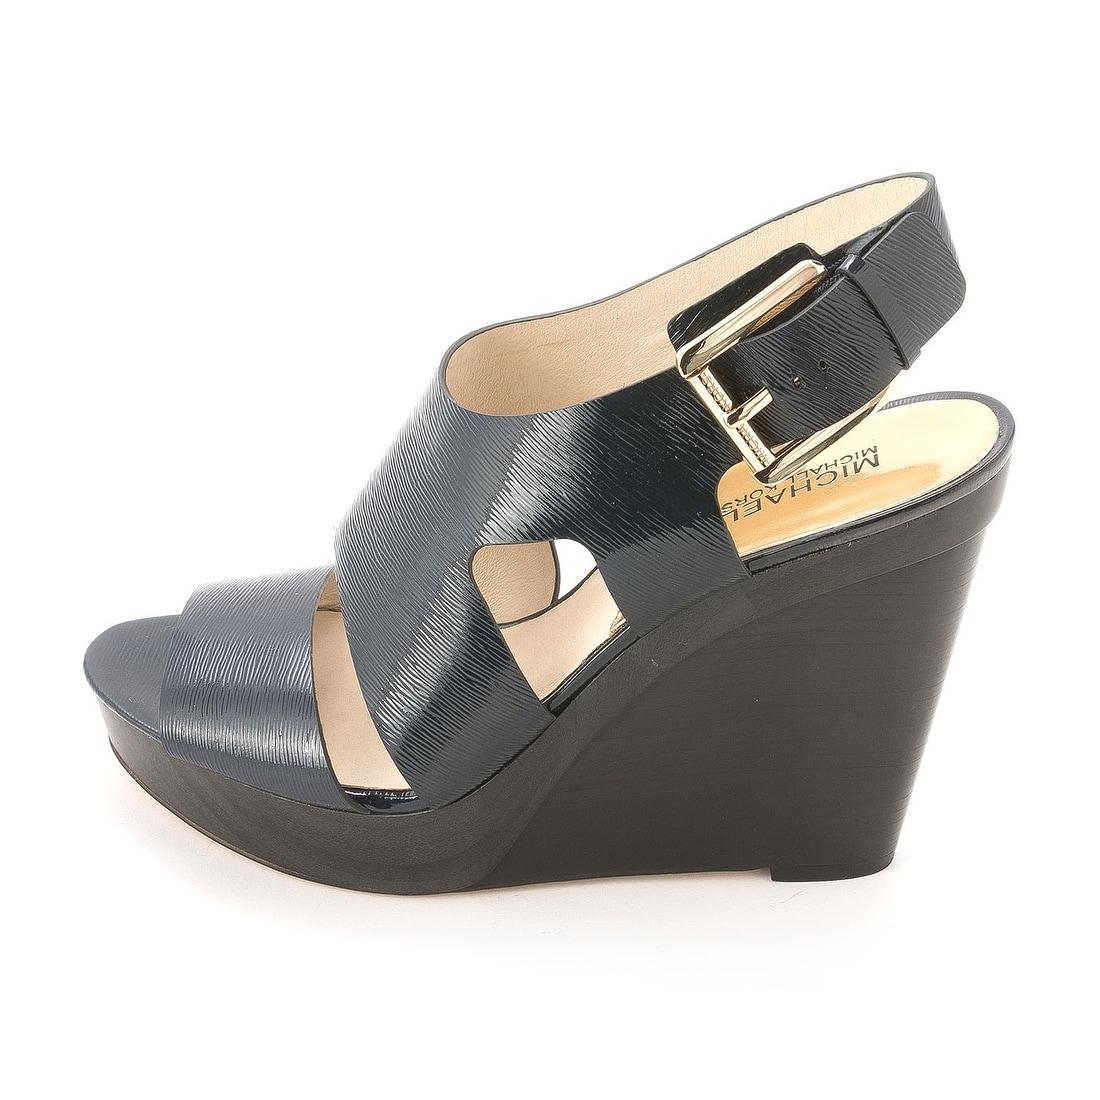 f939a0eb3ff Shop MICHAEL Michael Kors Women s Carla Platform Wedge Sandals - Free  Shipping Today - Overstock - 14537433